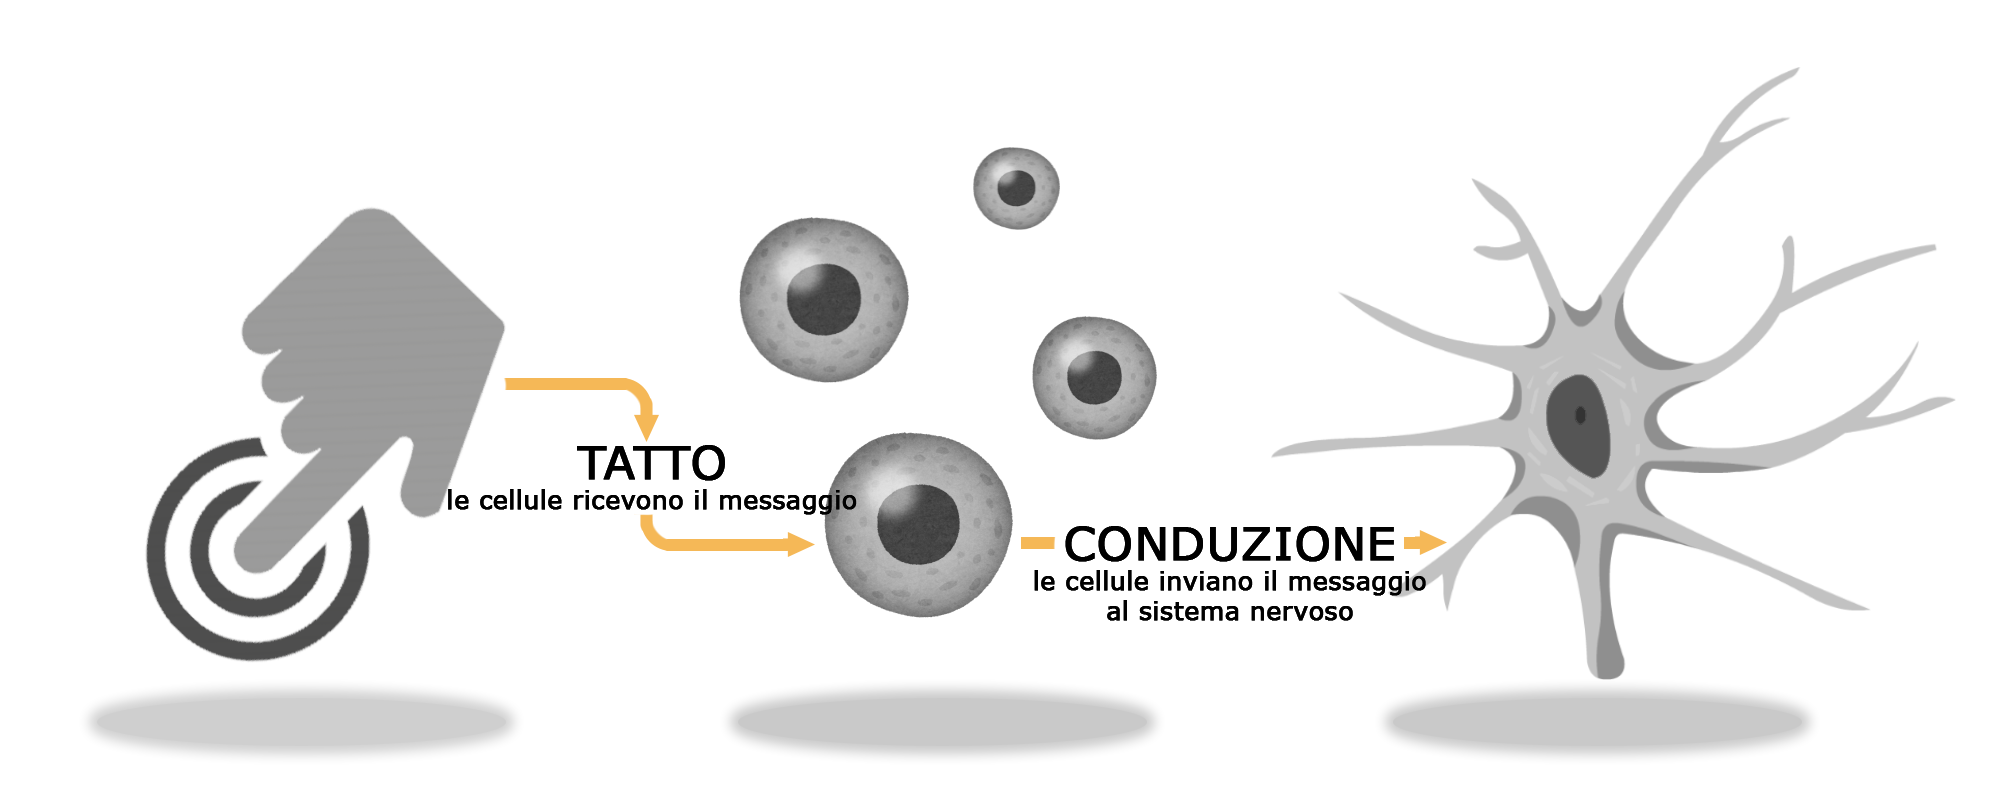 sistema nervoso icona